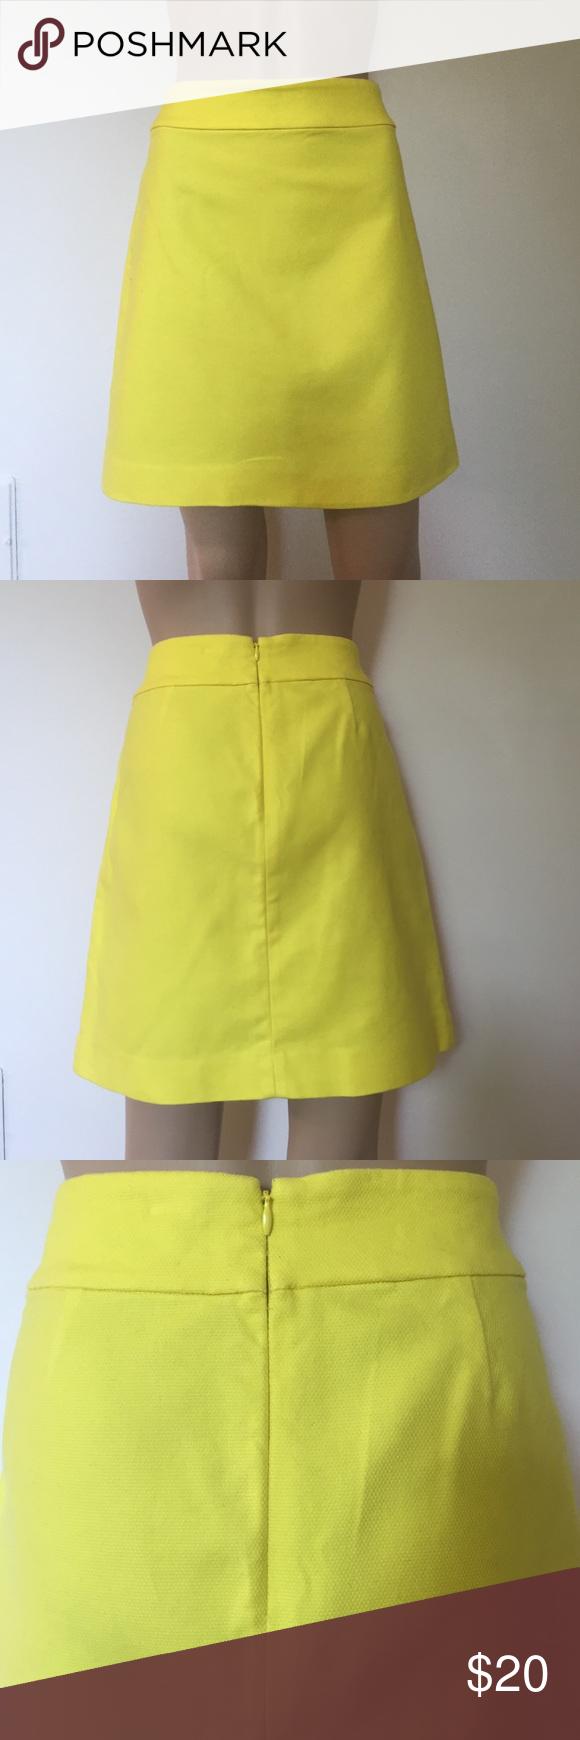 bc3791a1e7 Ann Taylor Loft Yellow skirt size 4 Bright yellow Ann Taylor size 4  stretchy skirt.